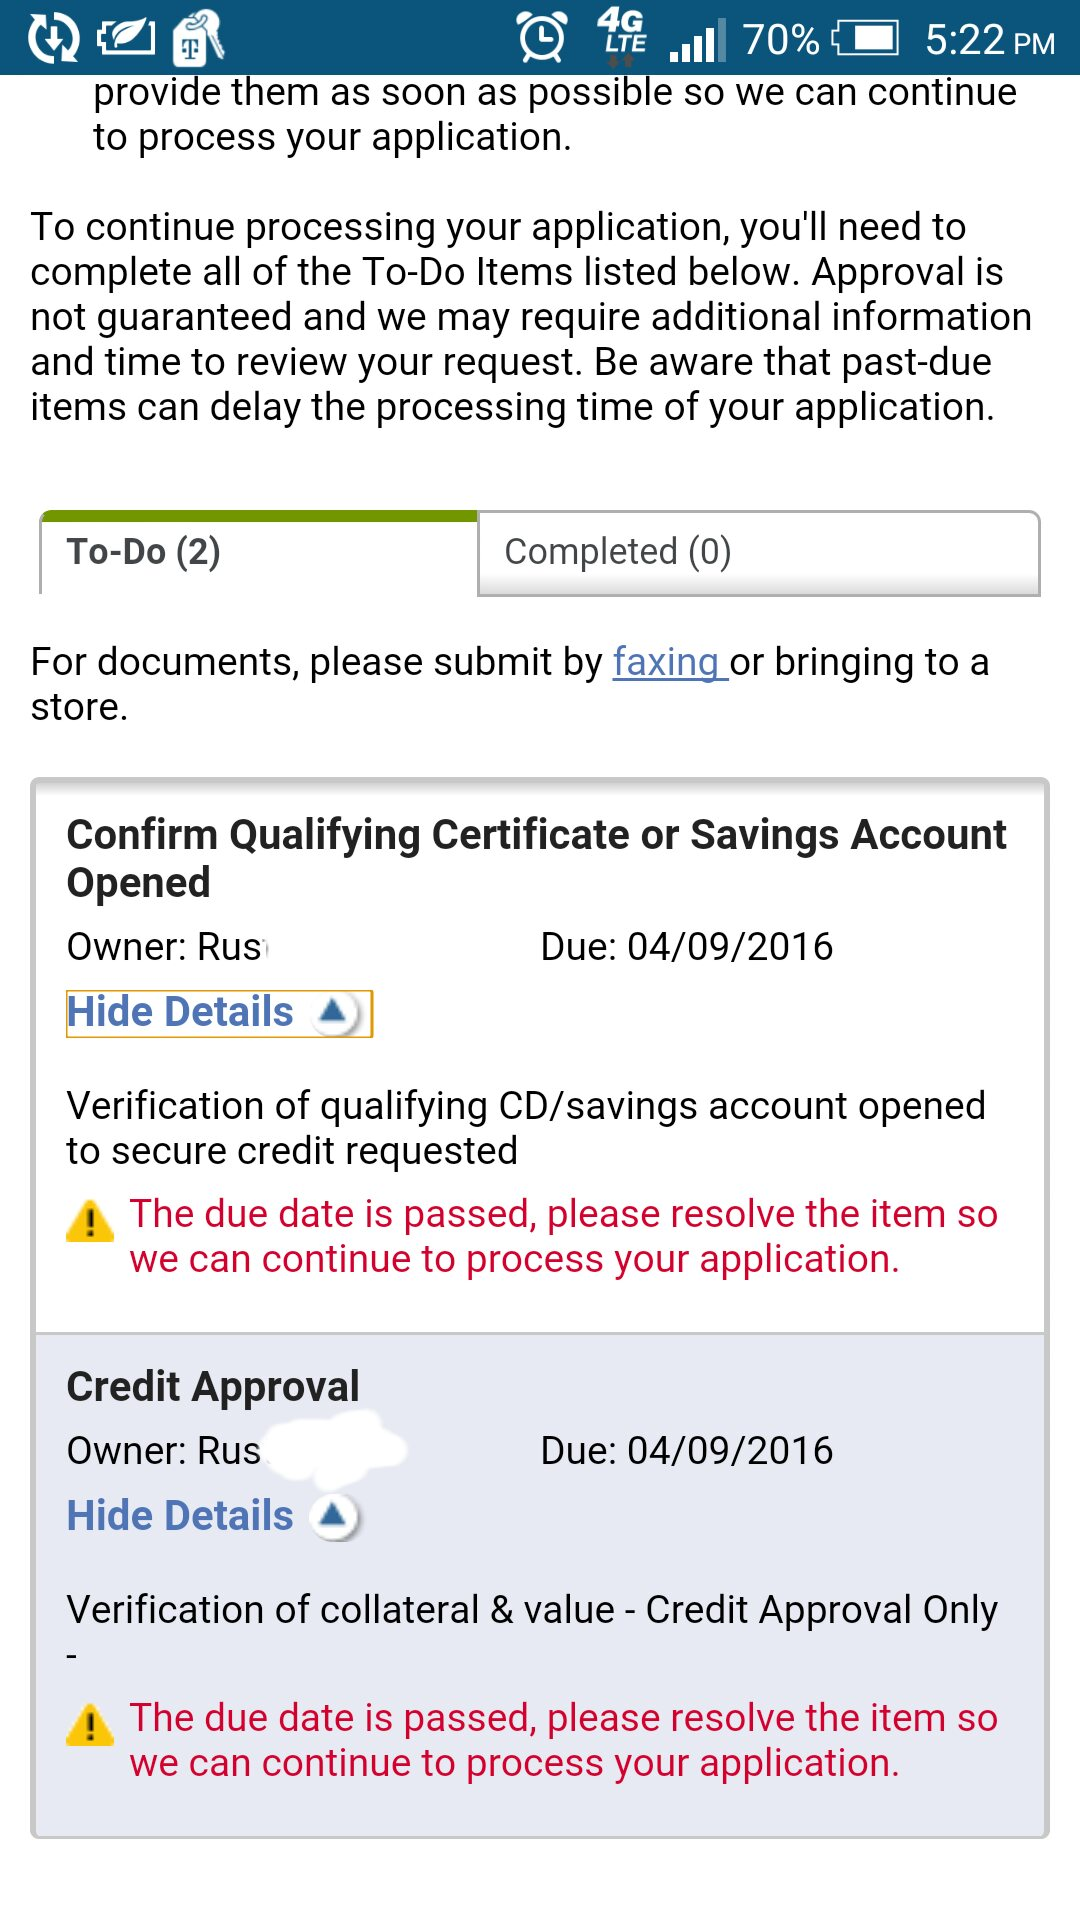 Iva payday loans image 10